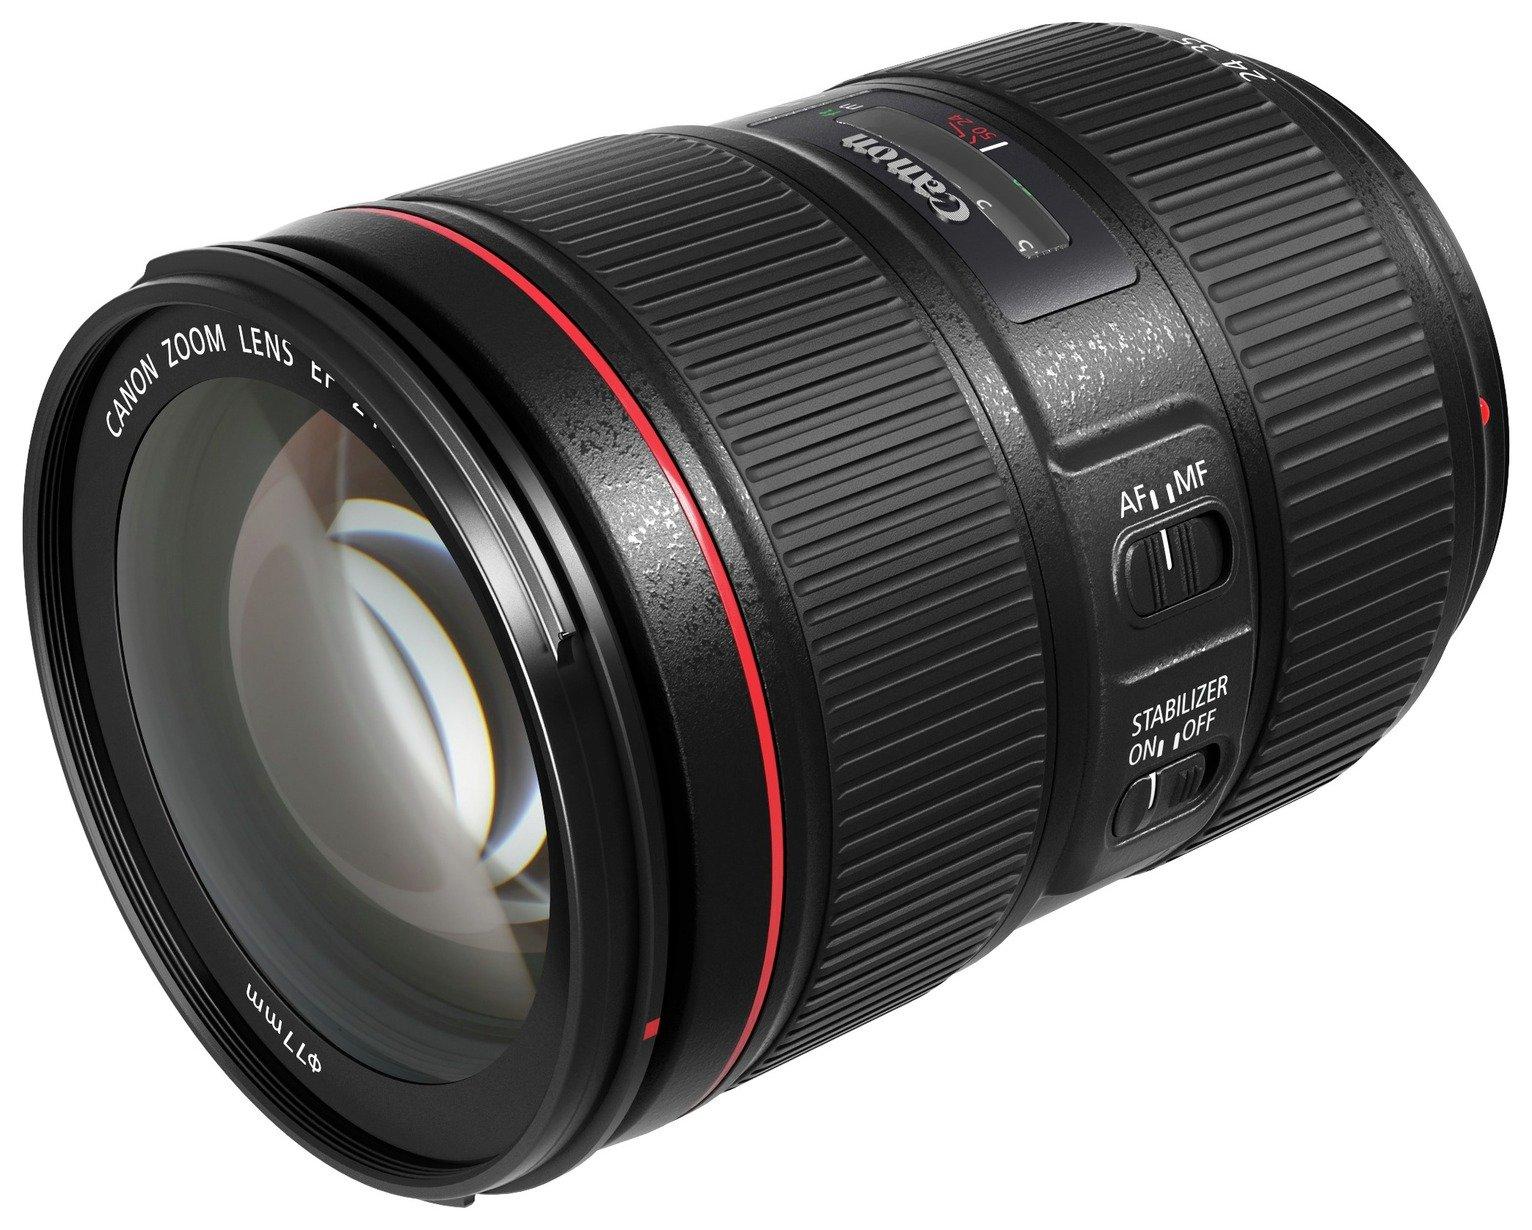 Canon 24-105mm EF/ EF-s Lens